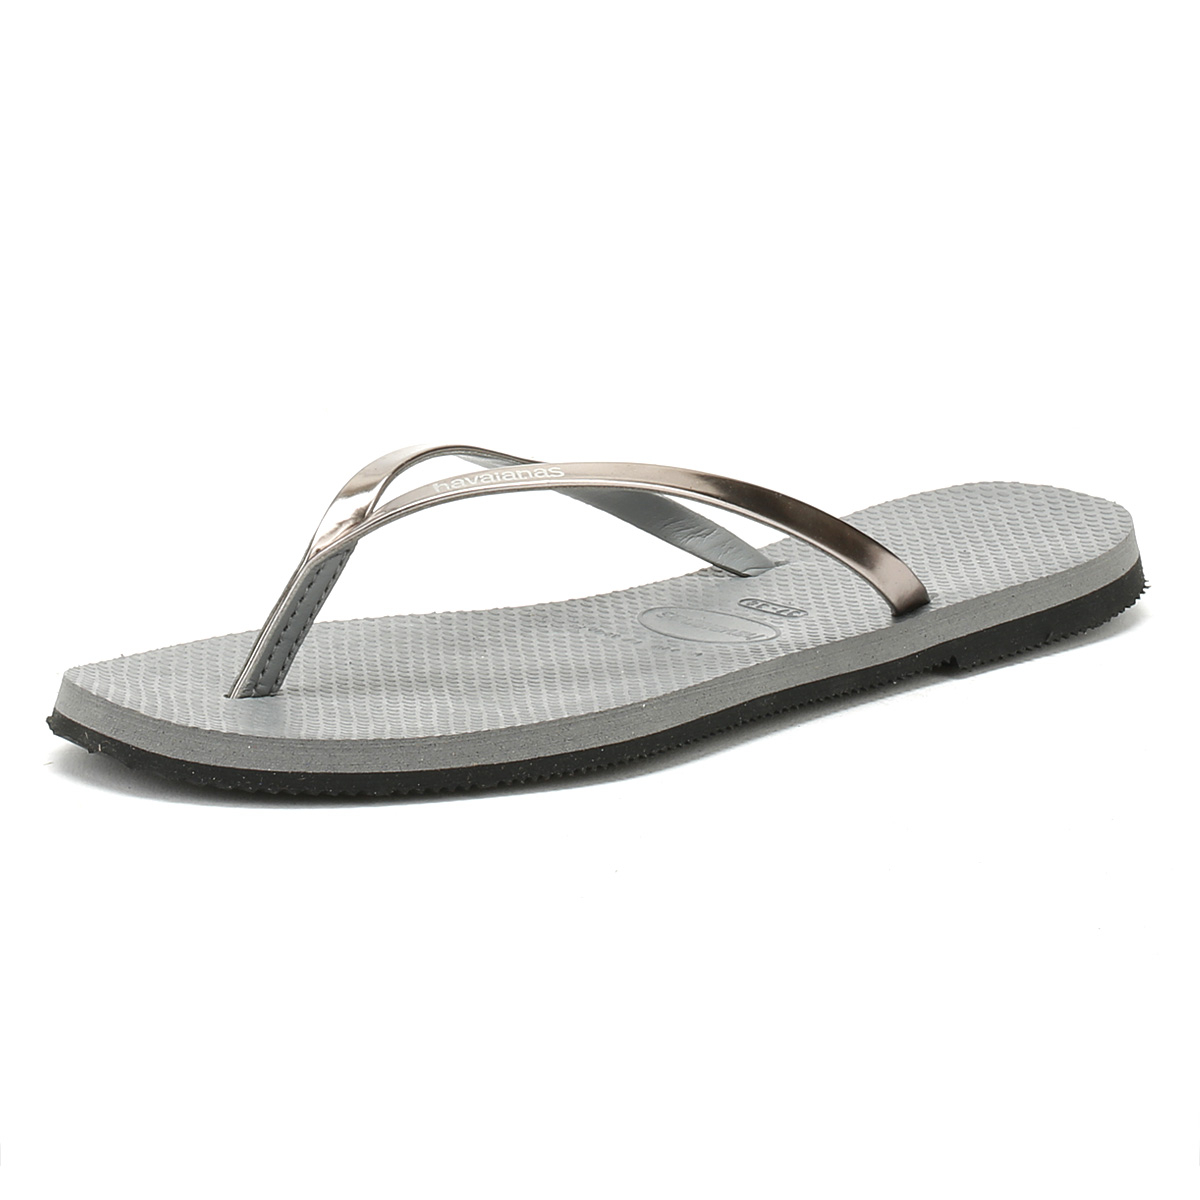 f1dba5fe7 Details about Havaianas Womens Sandals Grey You Metallic Flip Flops Summer  Beach Ladies Shoes